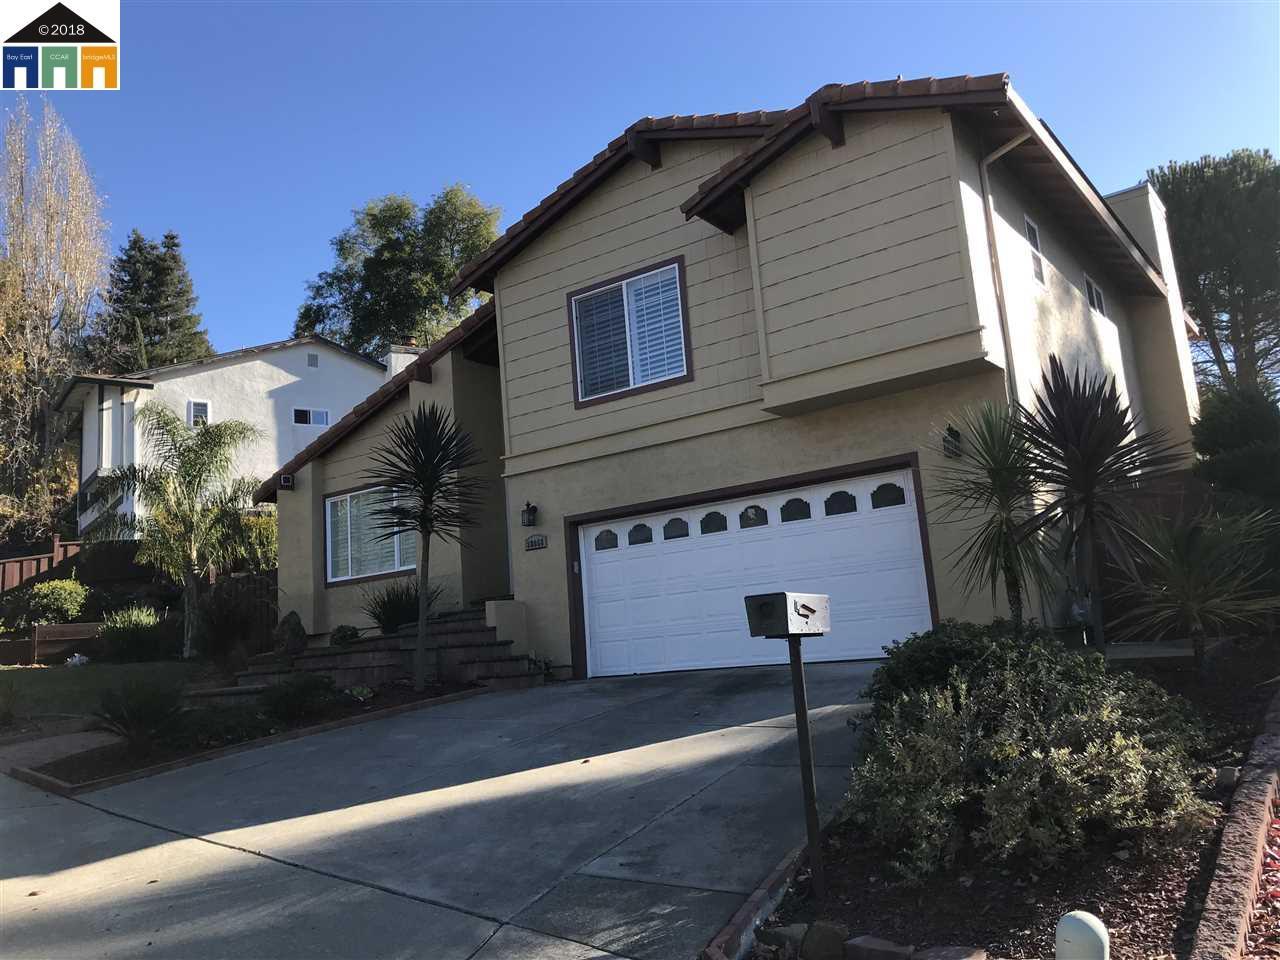 Single Family Home for Rent at 28068 Farm Hill 28068 Farm Hill Hayward, California 94542 United States